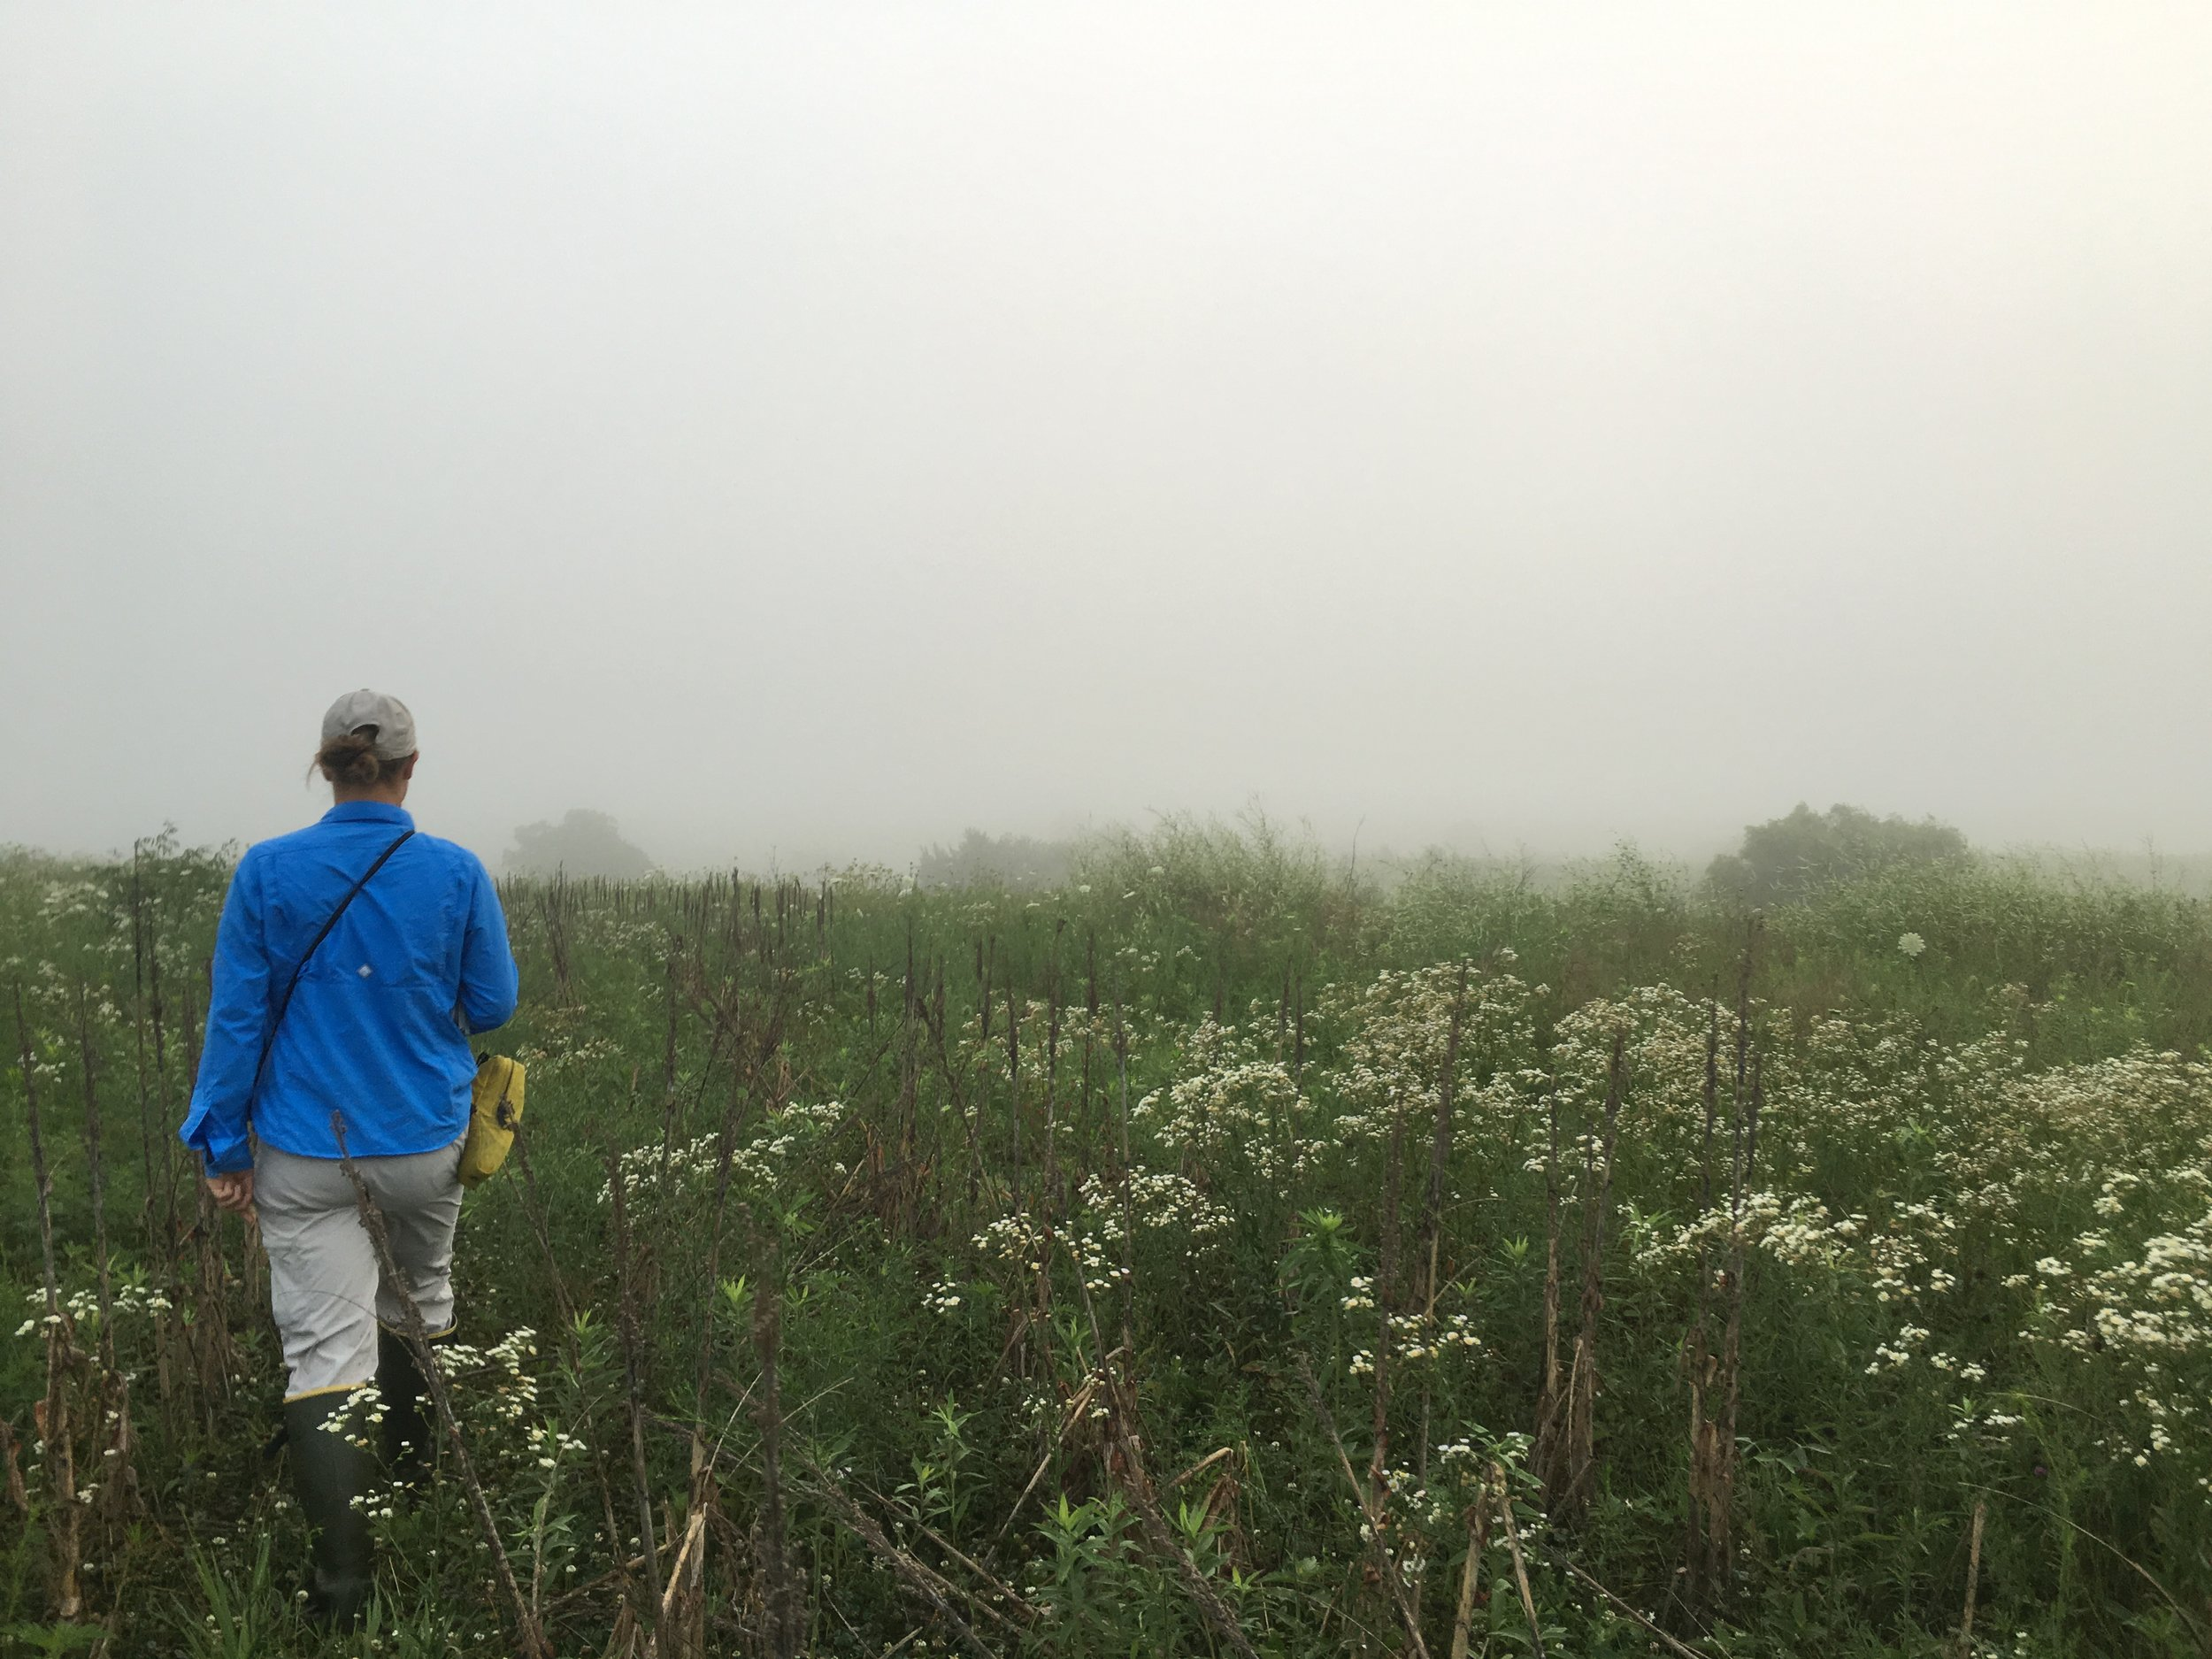 JJC_Iris in fog_RIE_2016.JPG